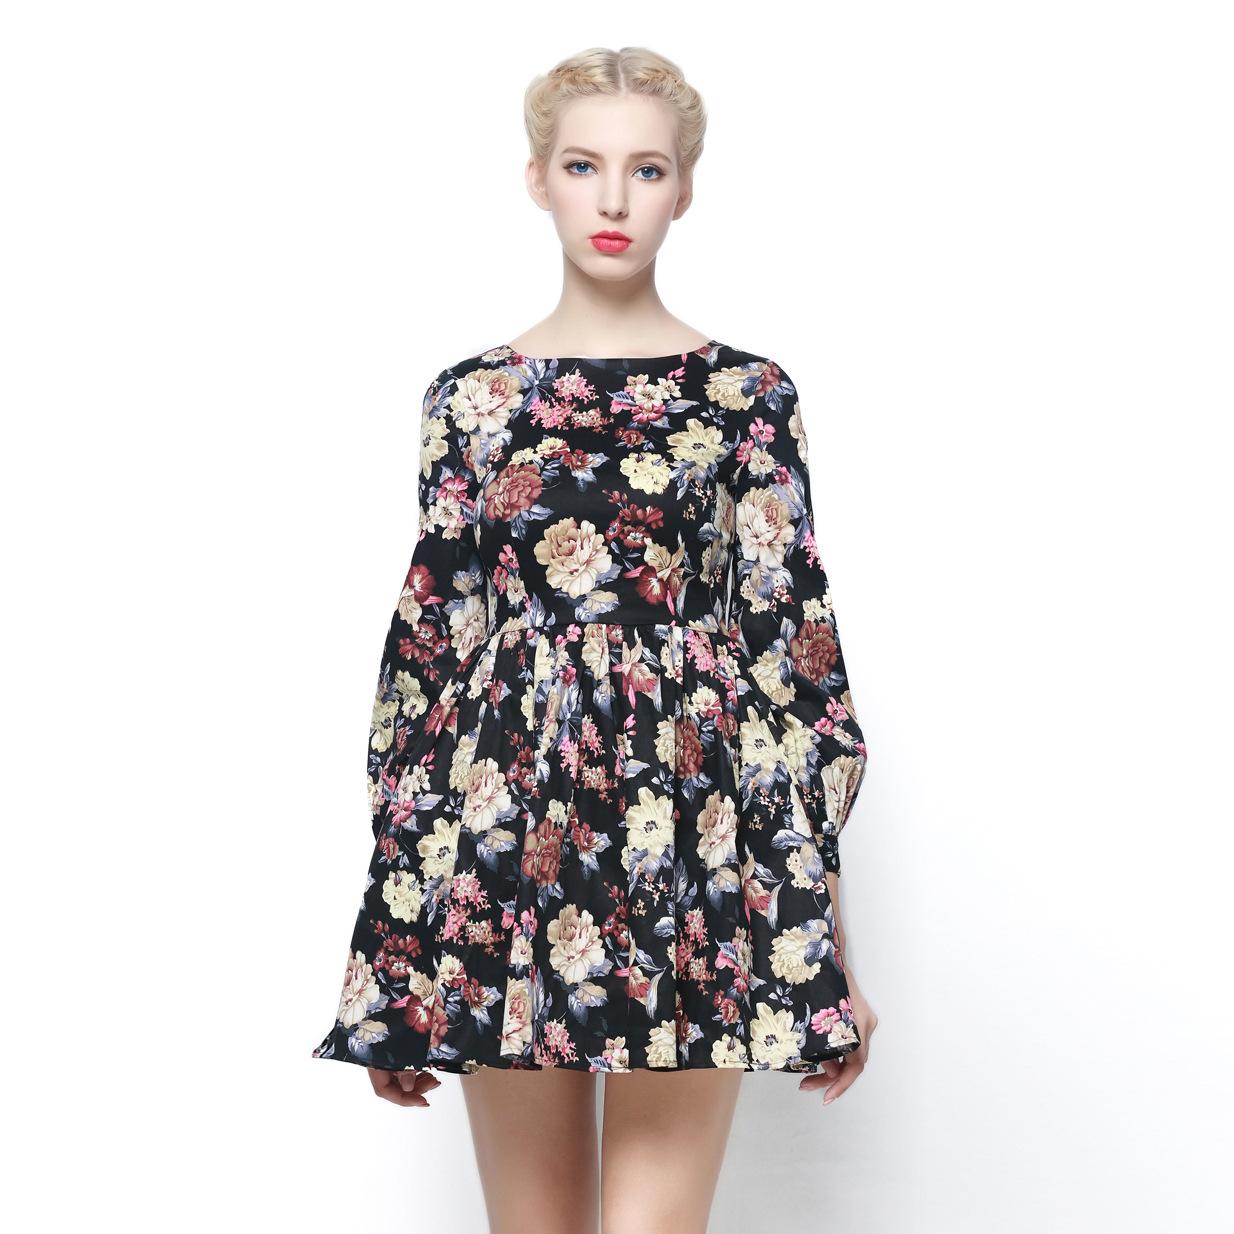 Floral dress new  spring runway brand vintage pleated women dress